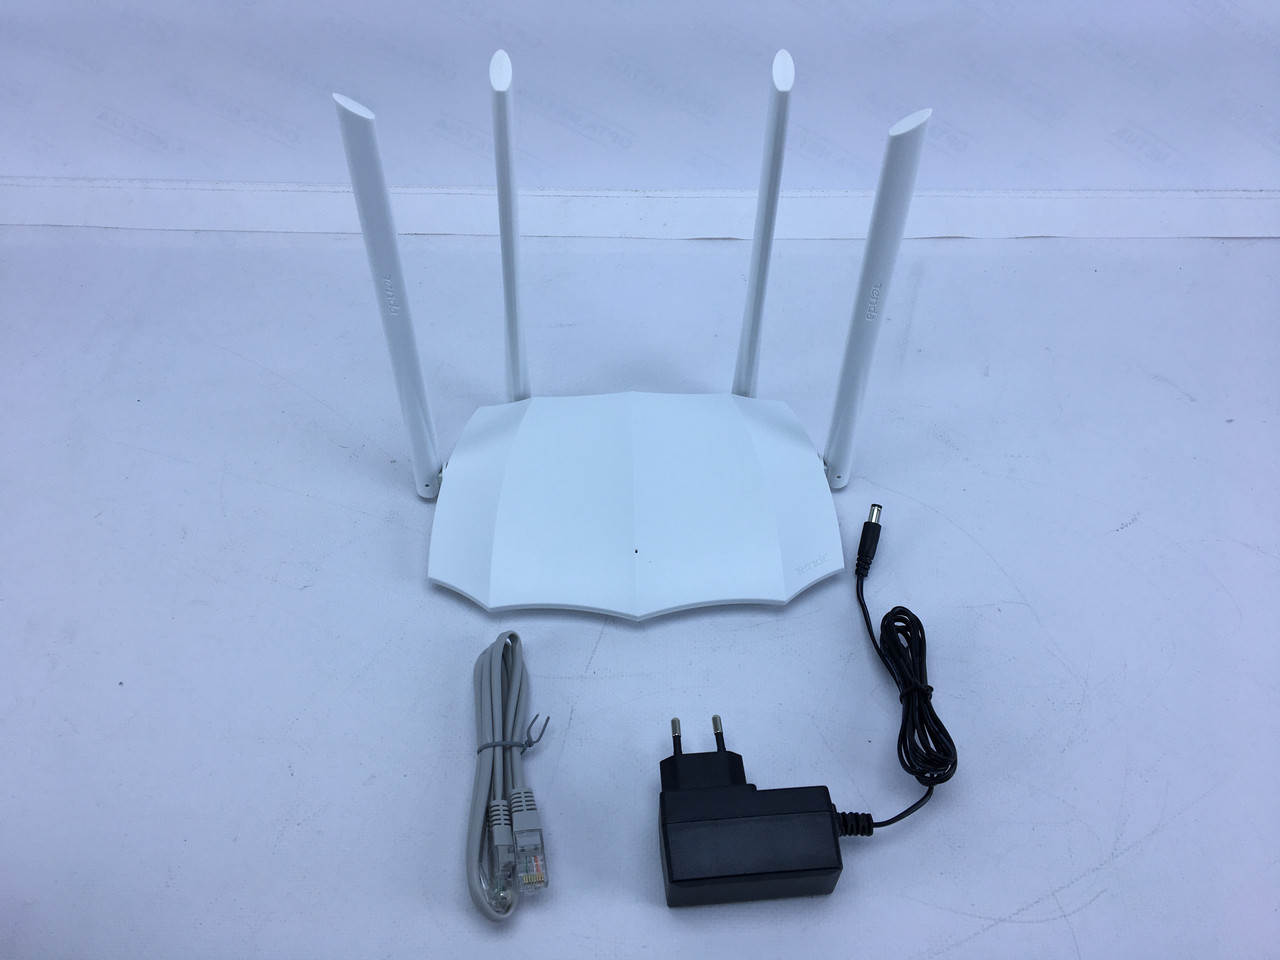 Маршрутизатор роутер Wi-Fi Tenda AC5 V3.0